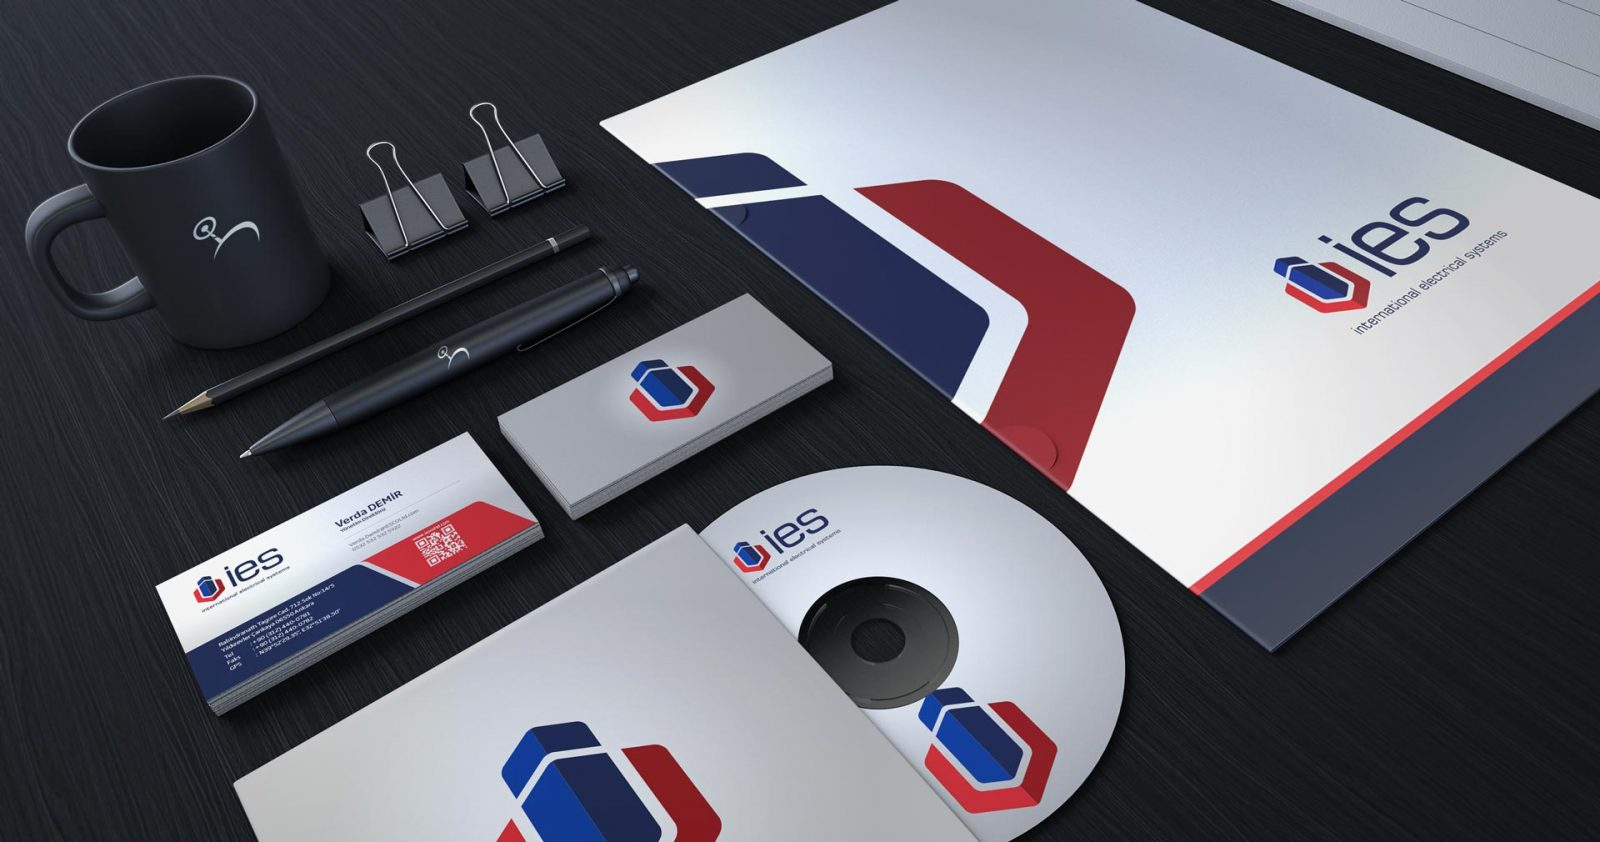 ies logo kurumsal kimlik tasarımı 04